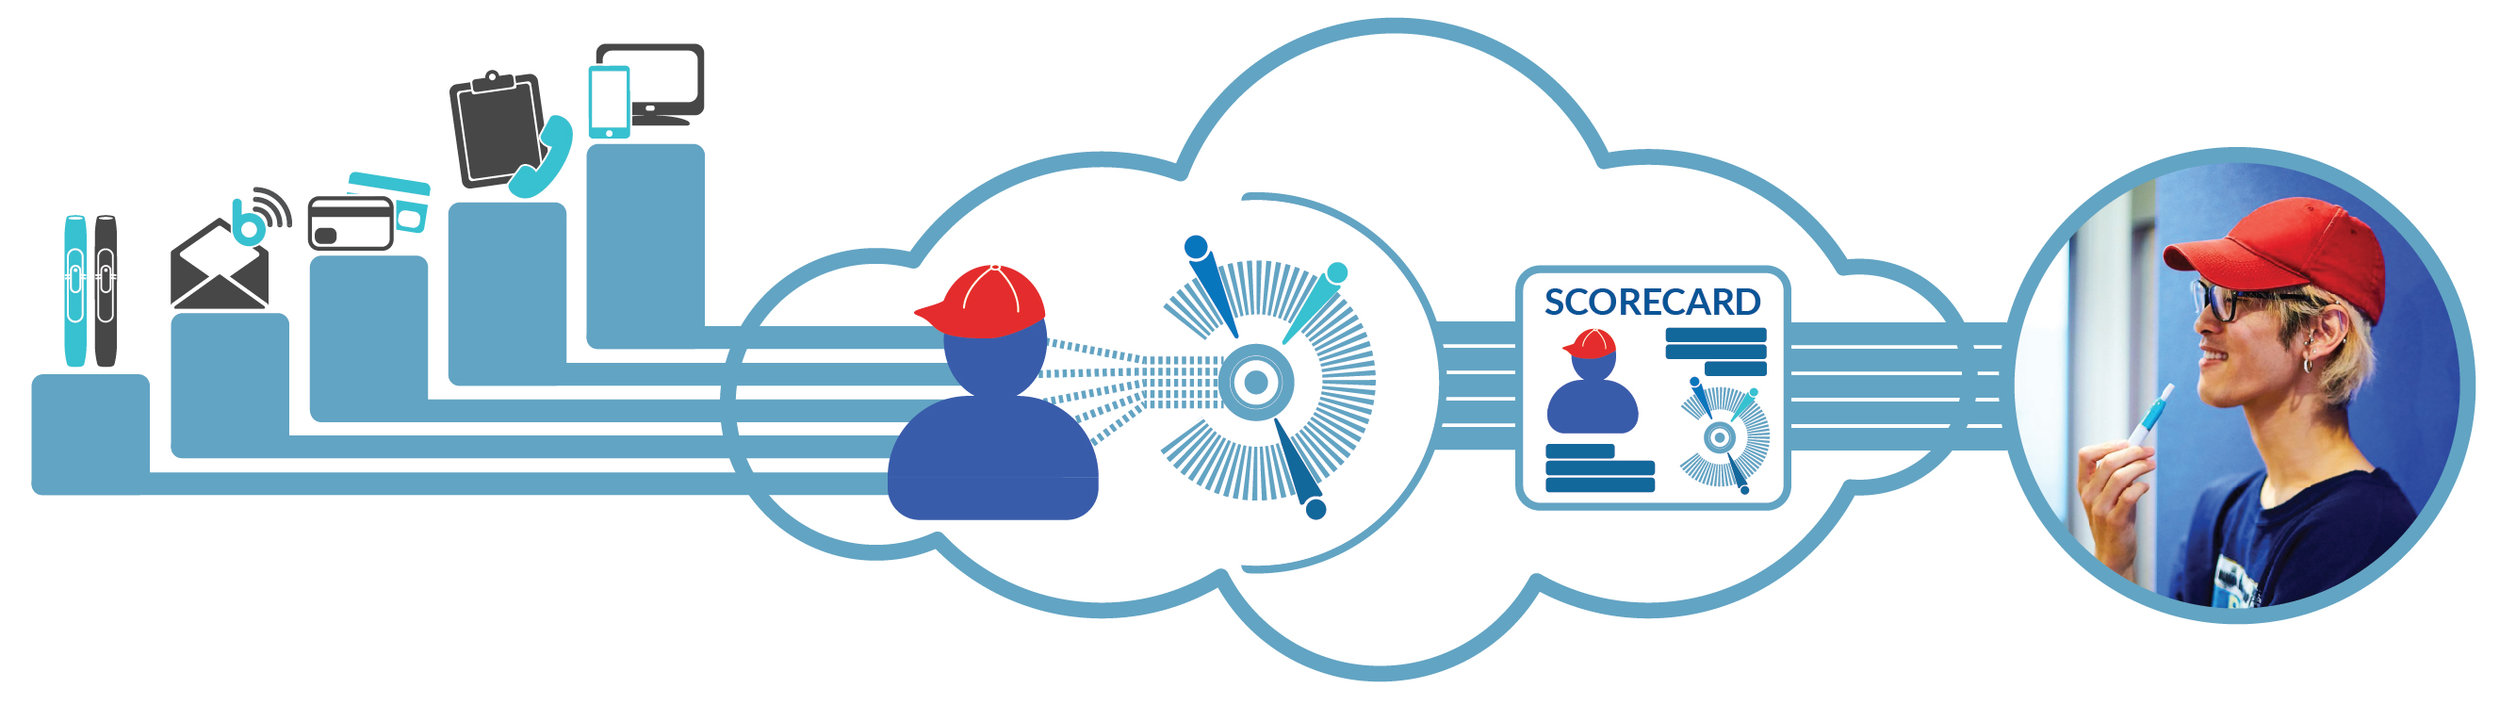 01_Relationship Cloud.jpg